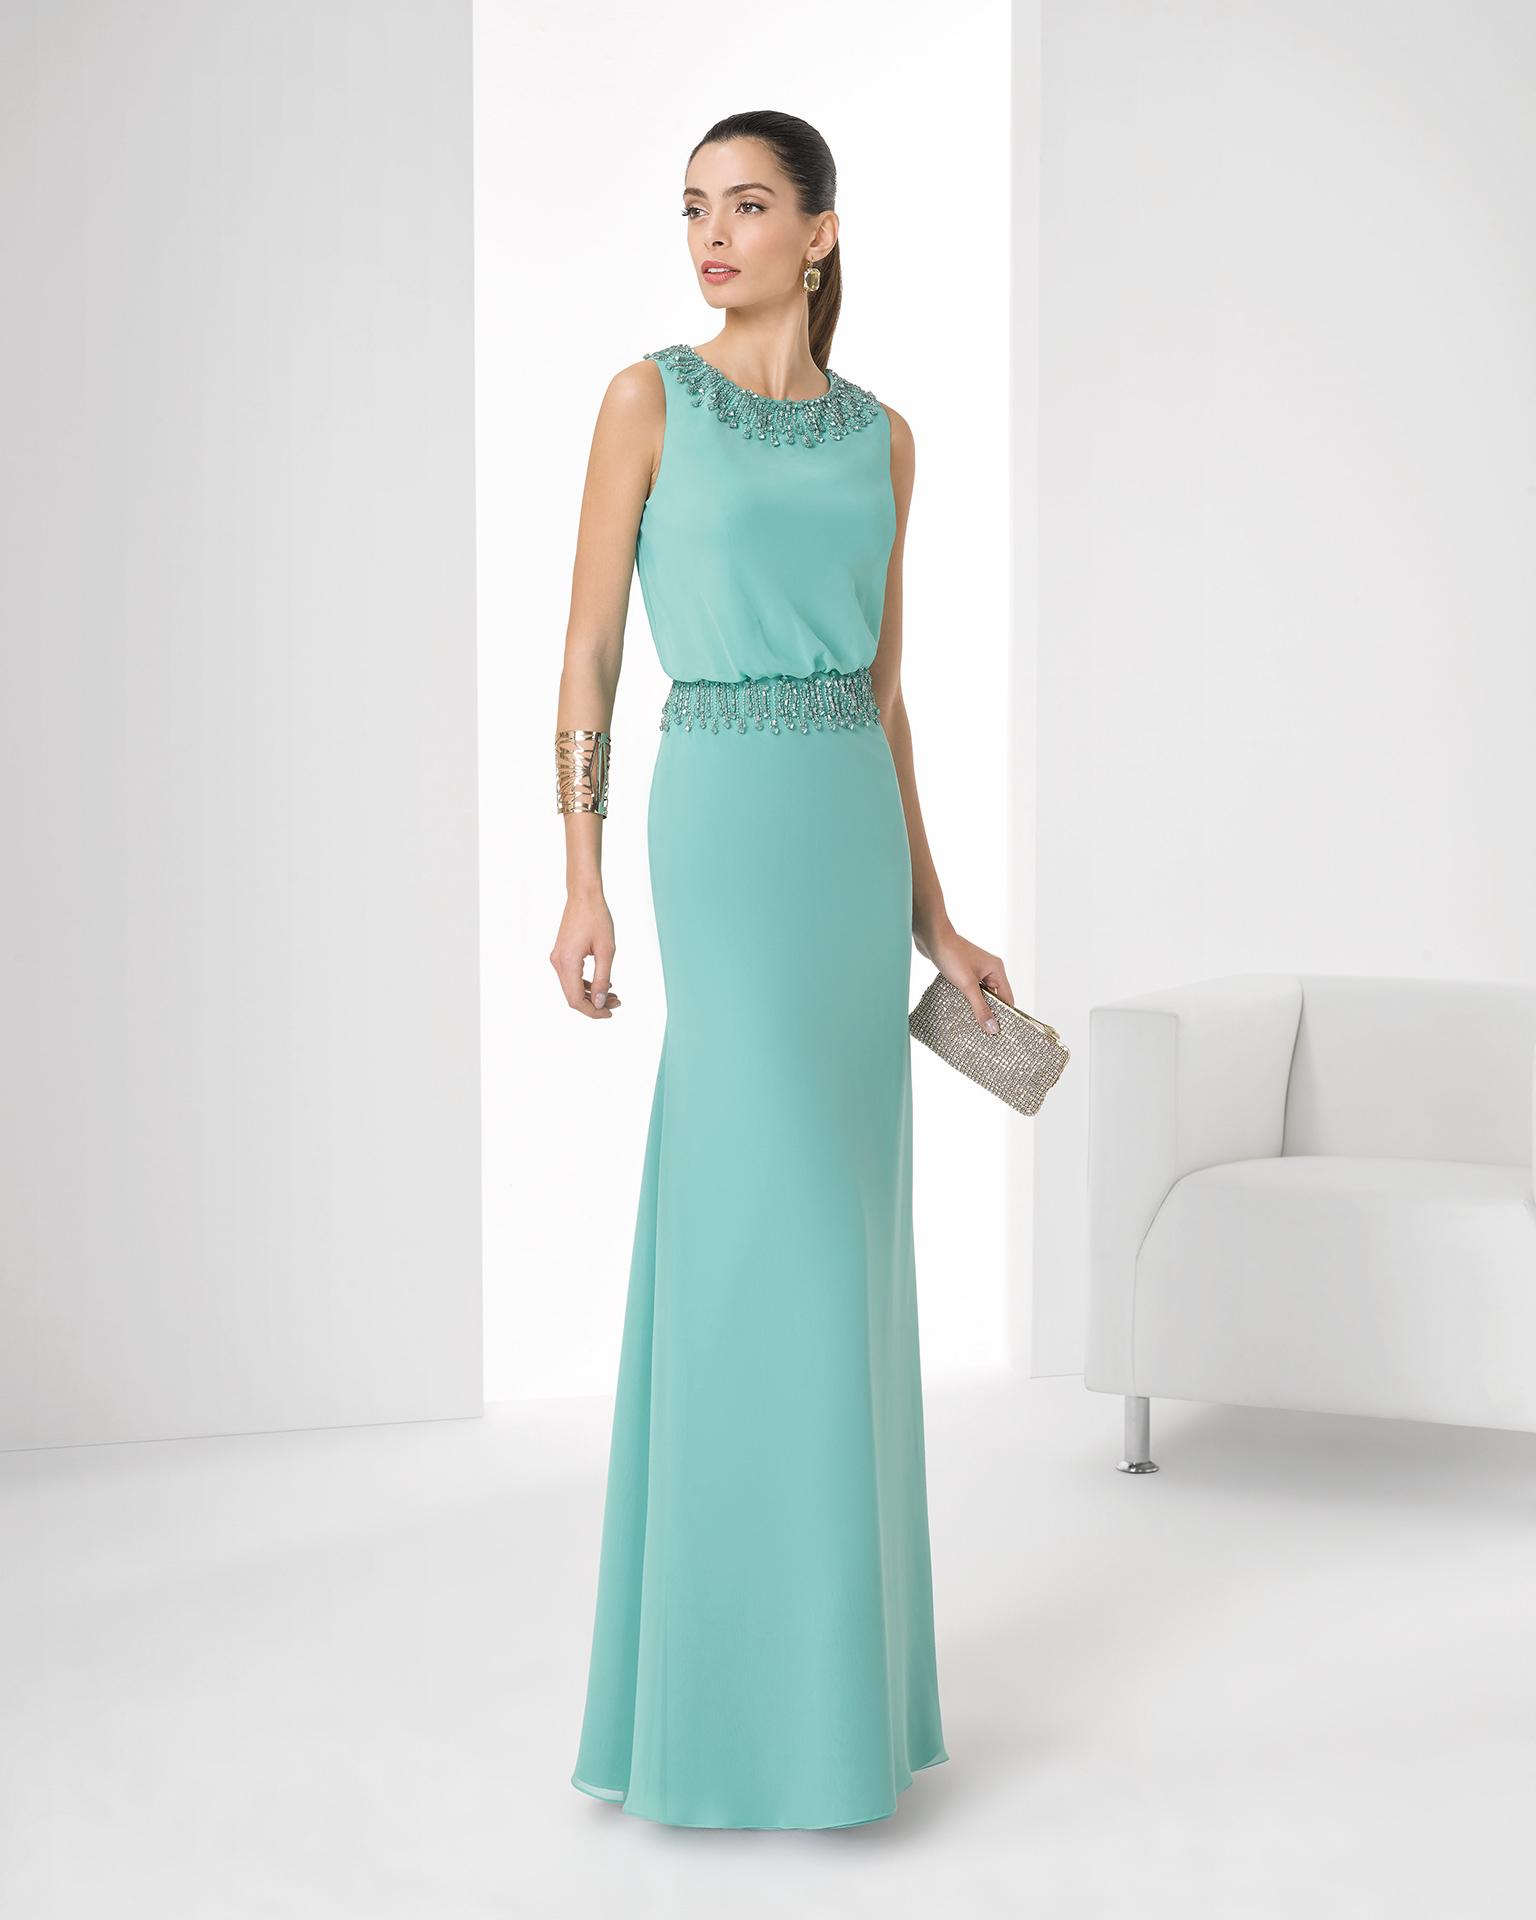 Vestido para bodas 2016